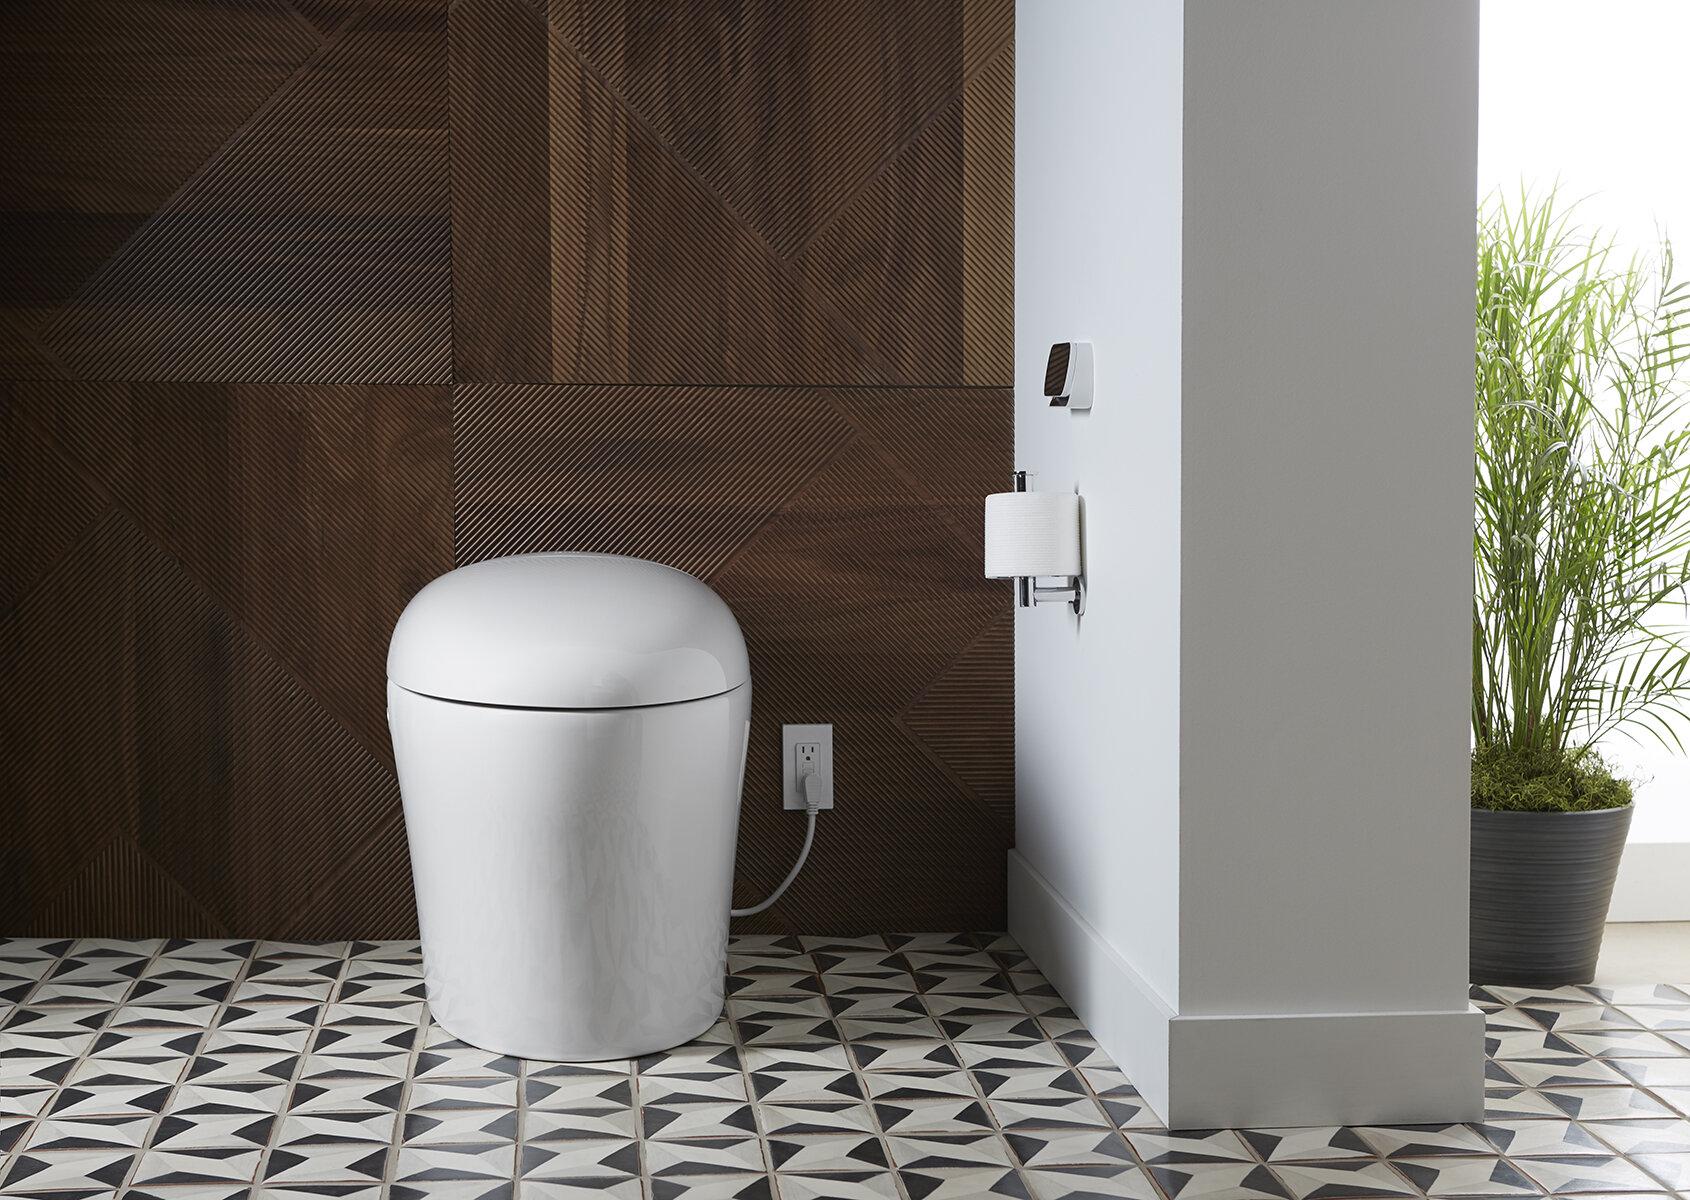 Excellent Karing 2 0 Intelligent Skirted One Piece Elongated Toilet Creativecarmelina Interior Chair Design Creativecarmelinacom